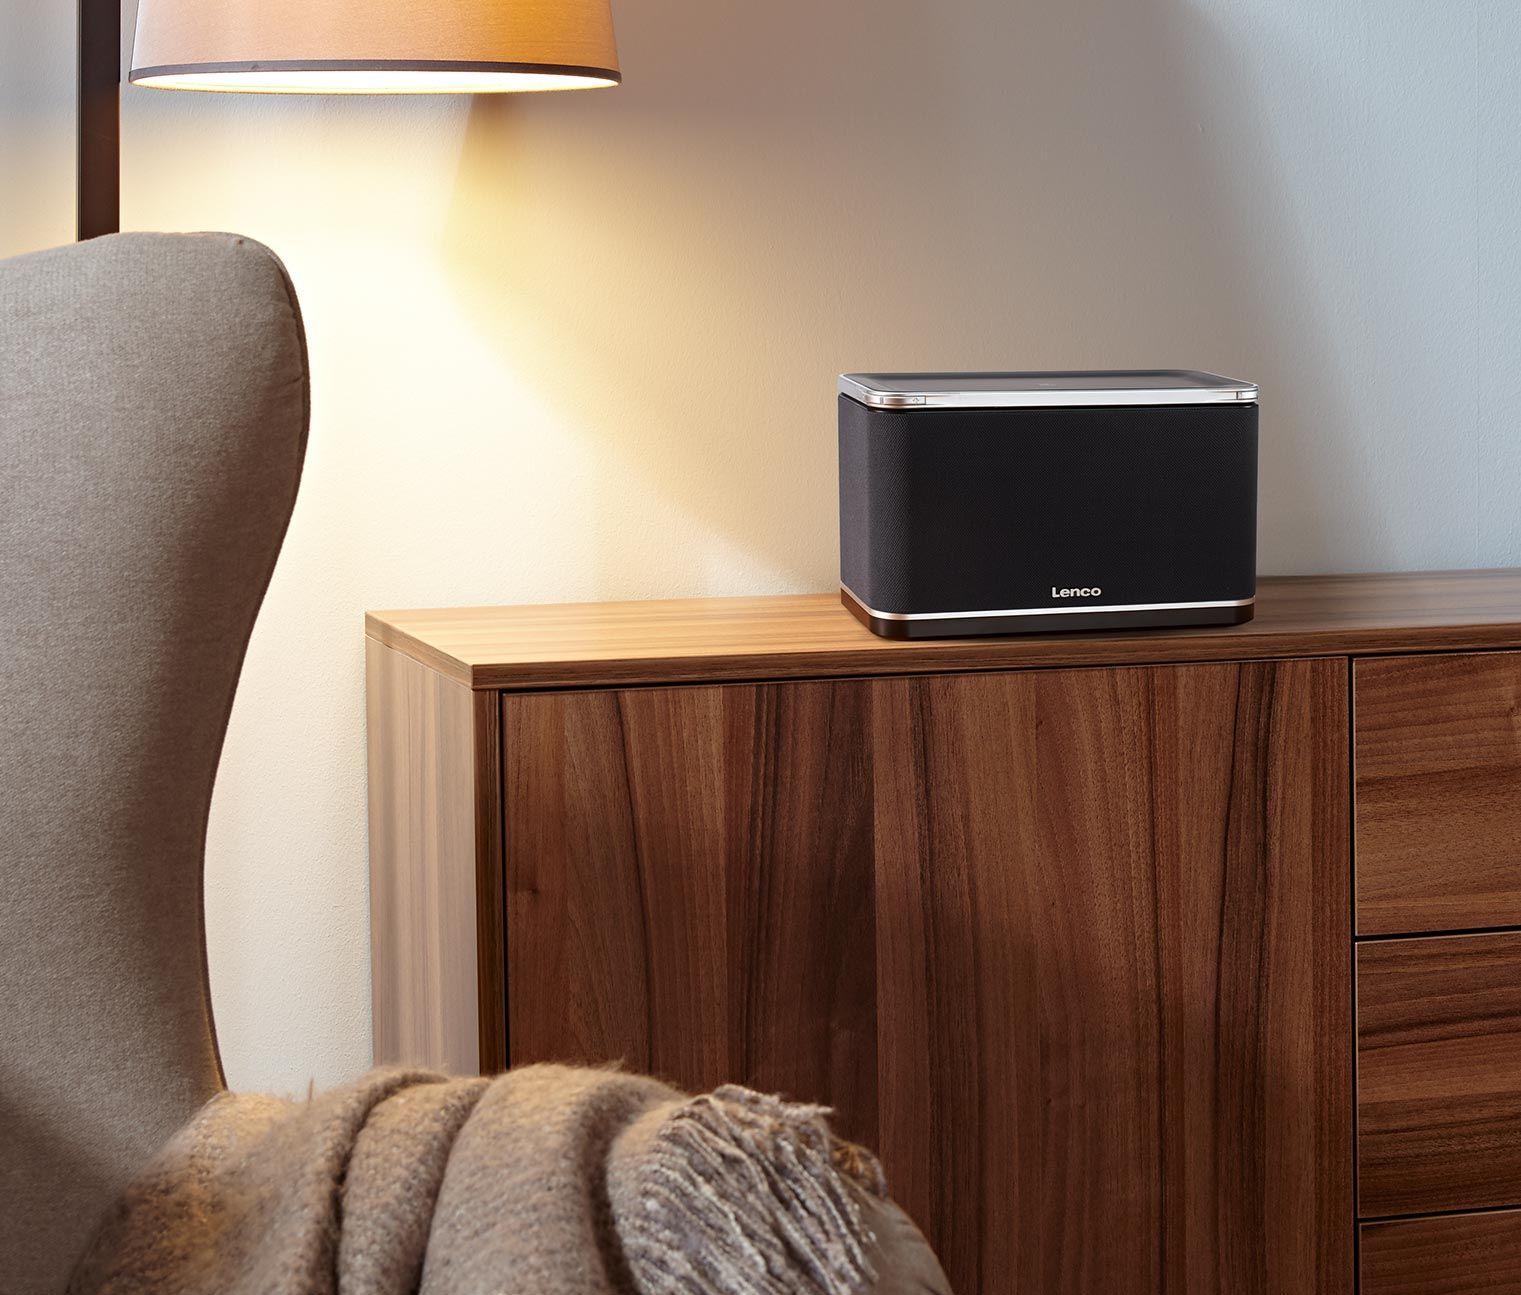 Multiroom-Wireless-Hi-Fi-System LENCO Playlink-6 online bestellen bei Tchibo 326859